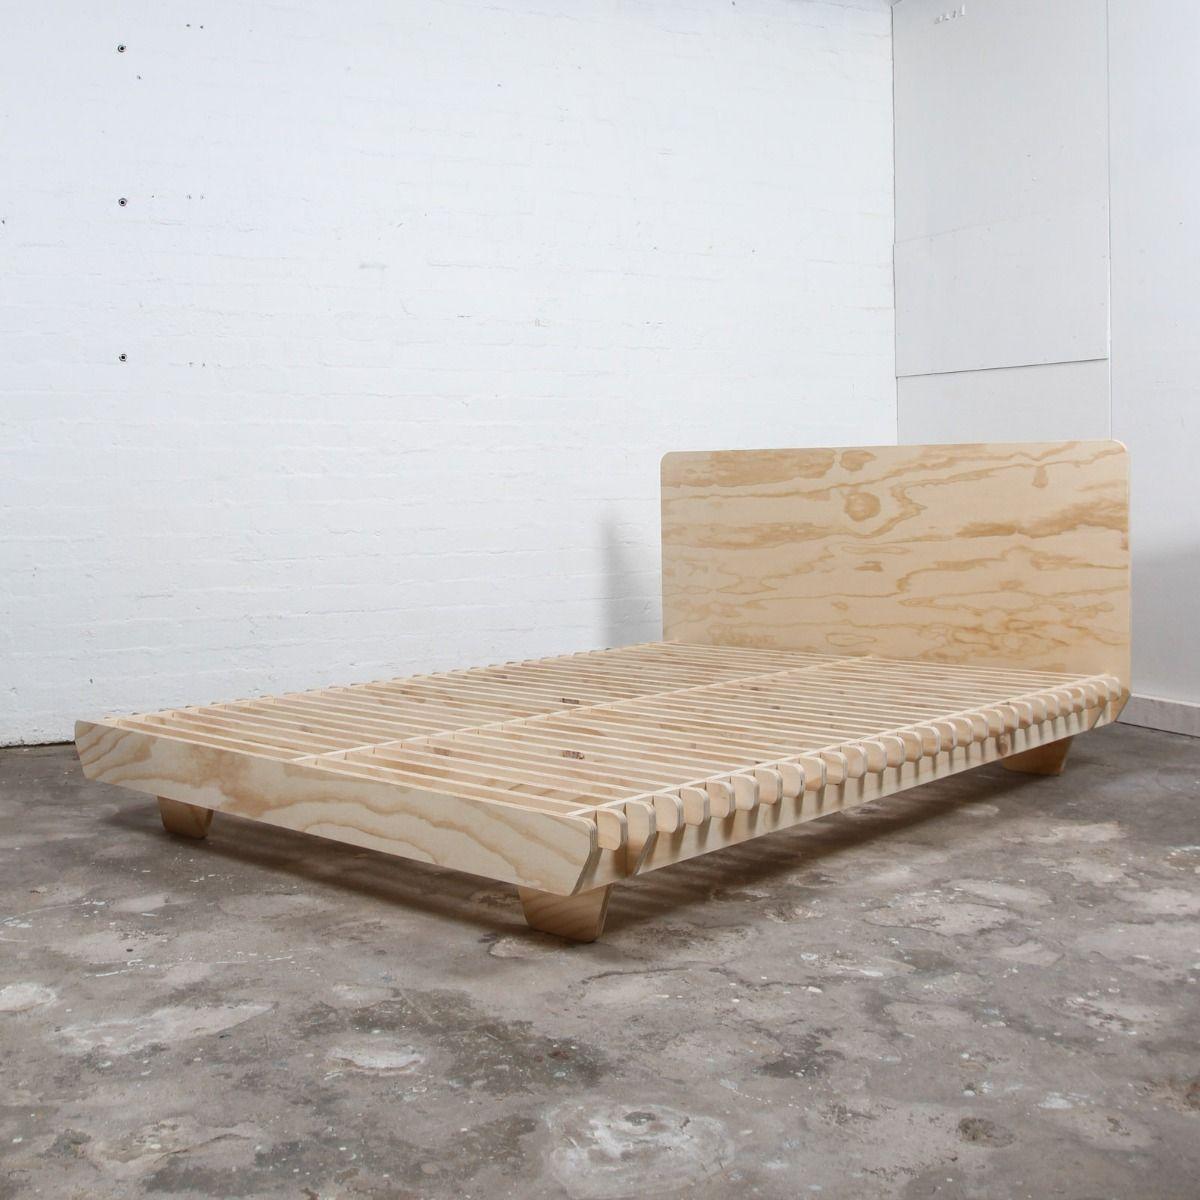 Flet Bed Plywood Bed Designs Homemade Bed Frame Crate Bed